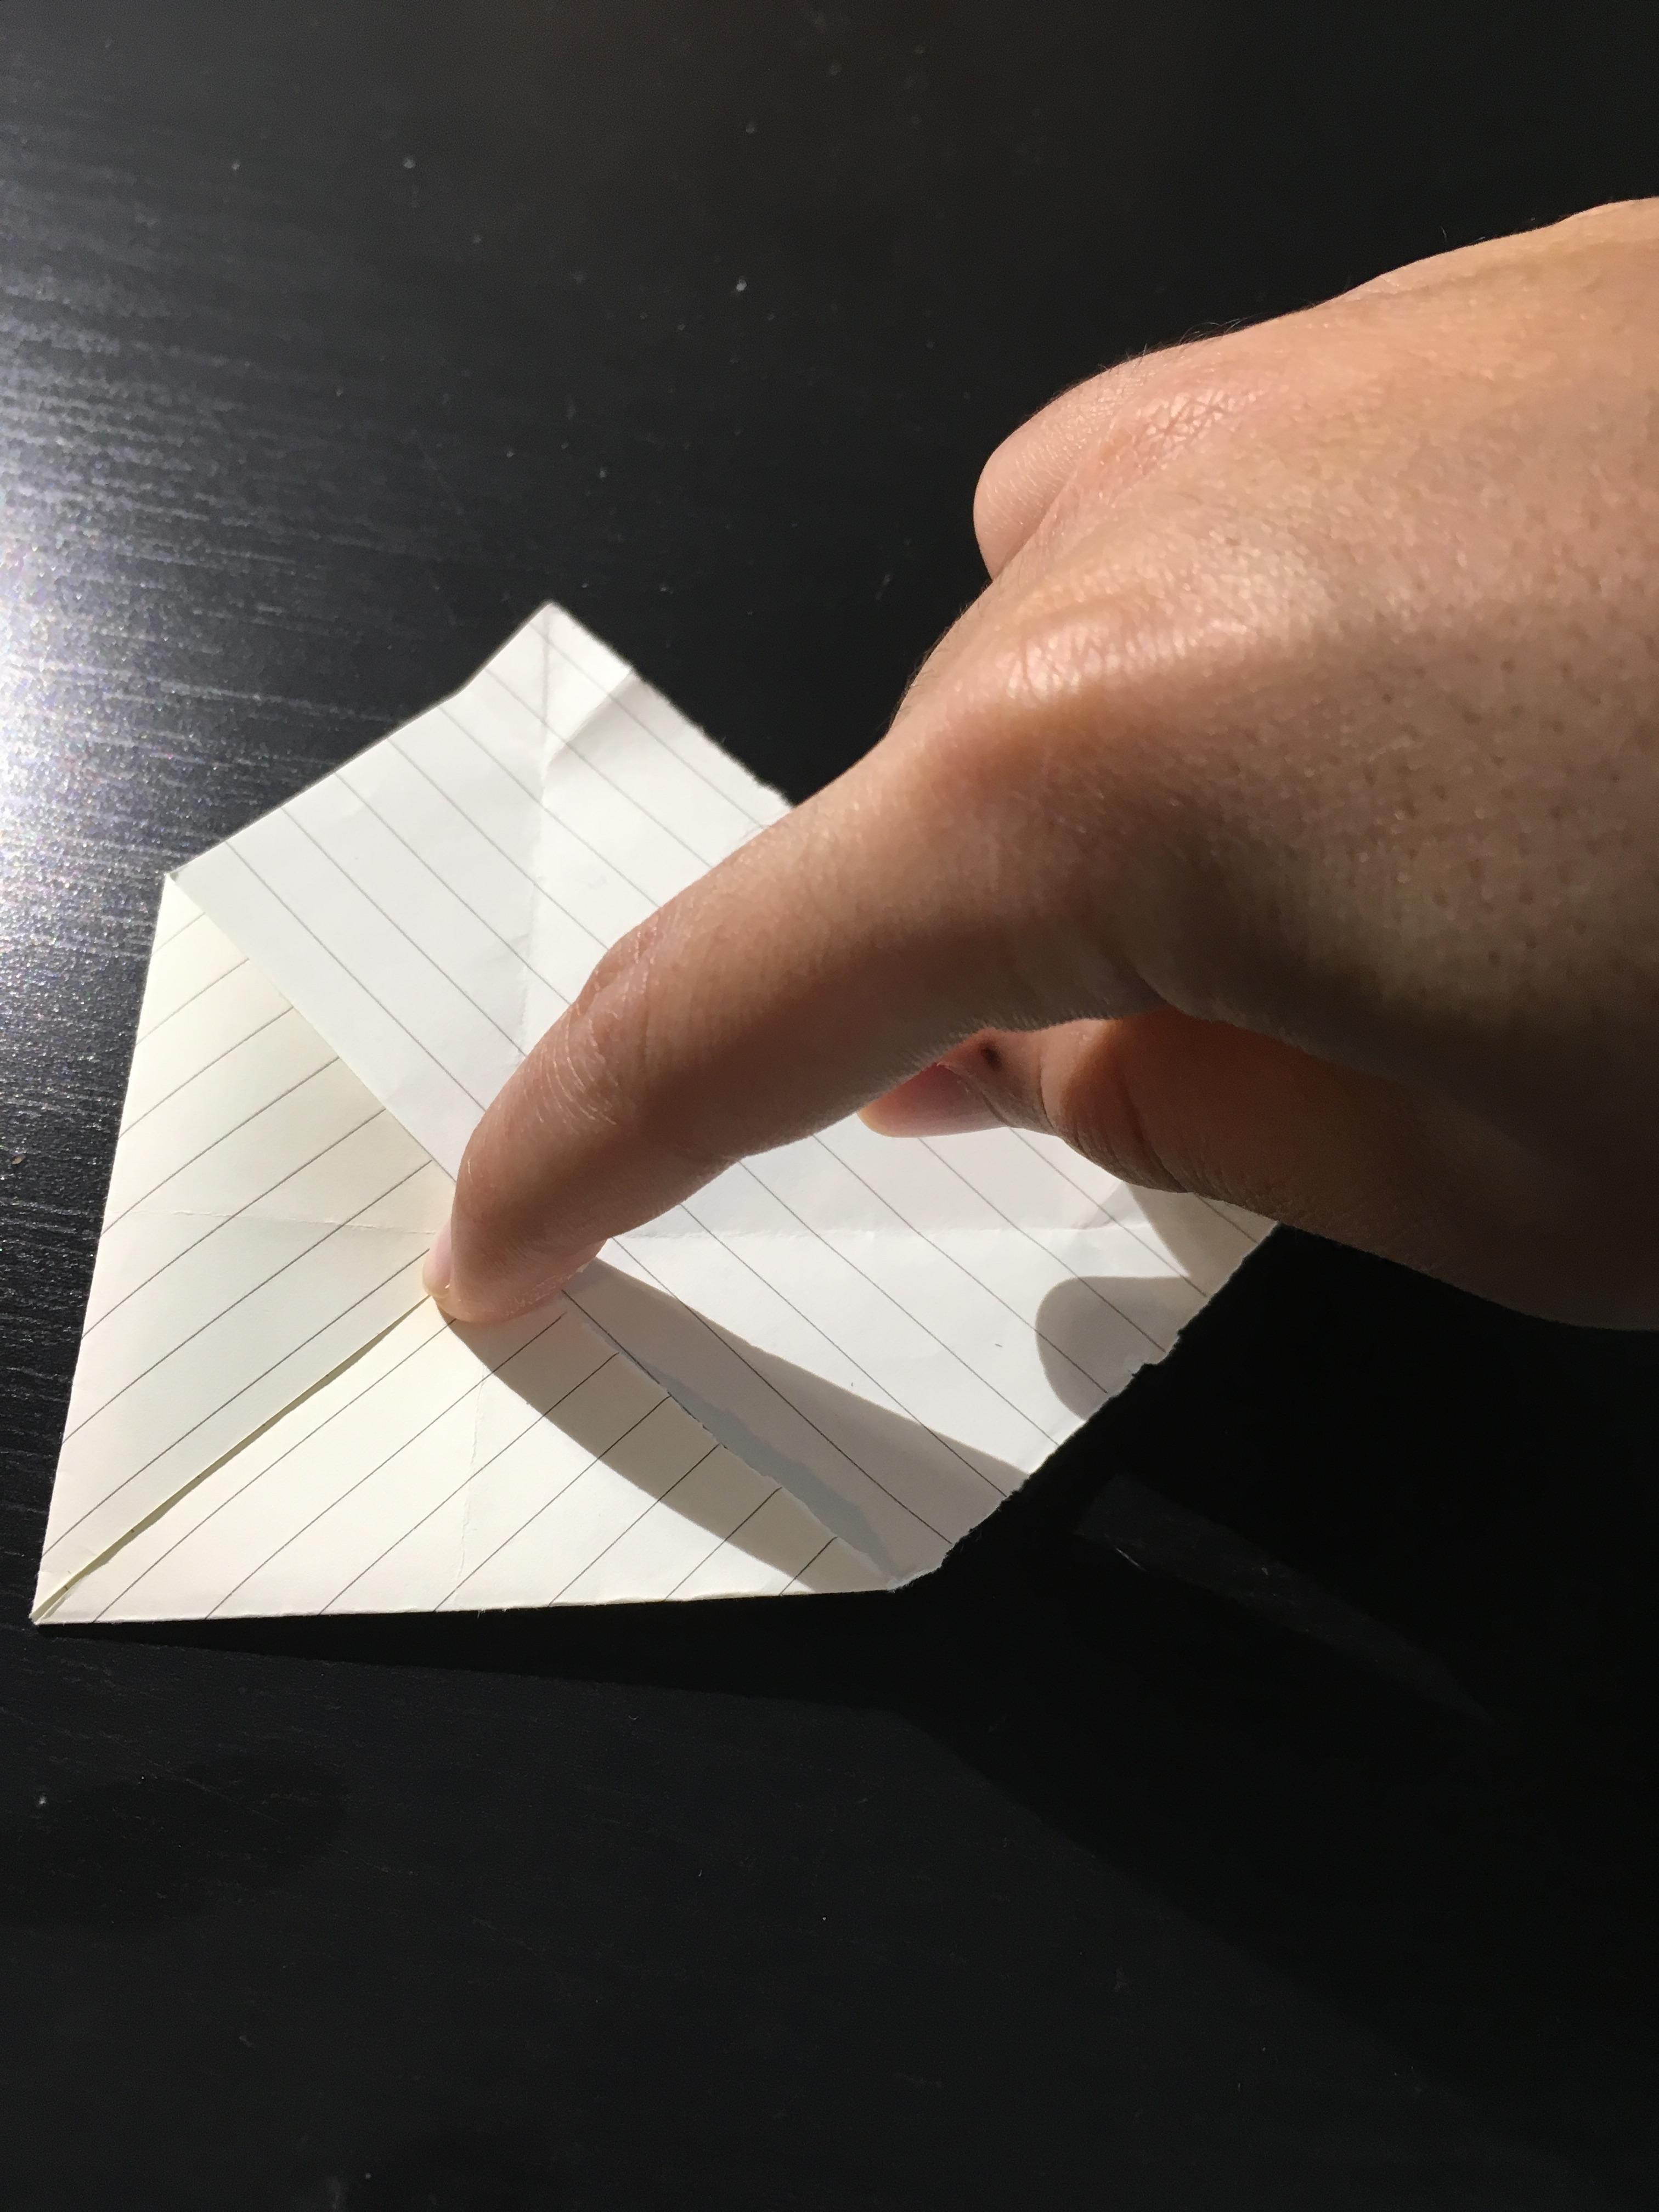 how to make a 8 sided ninja star